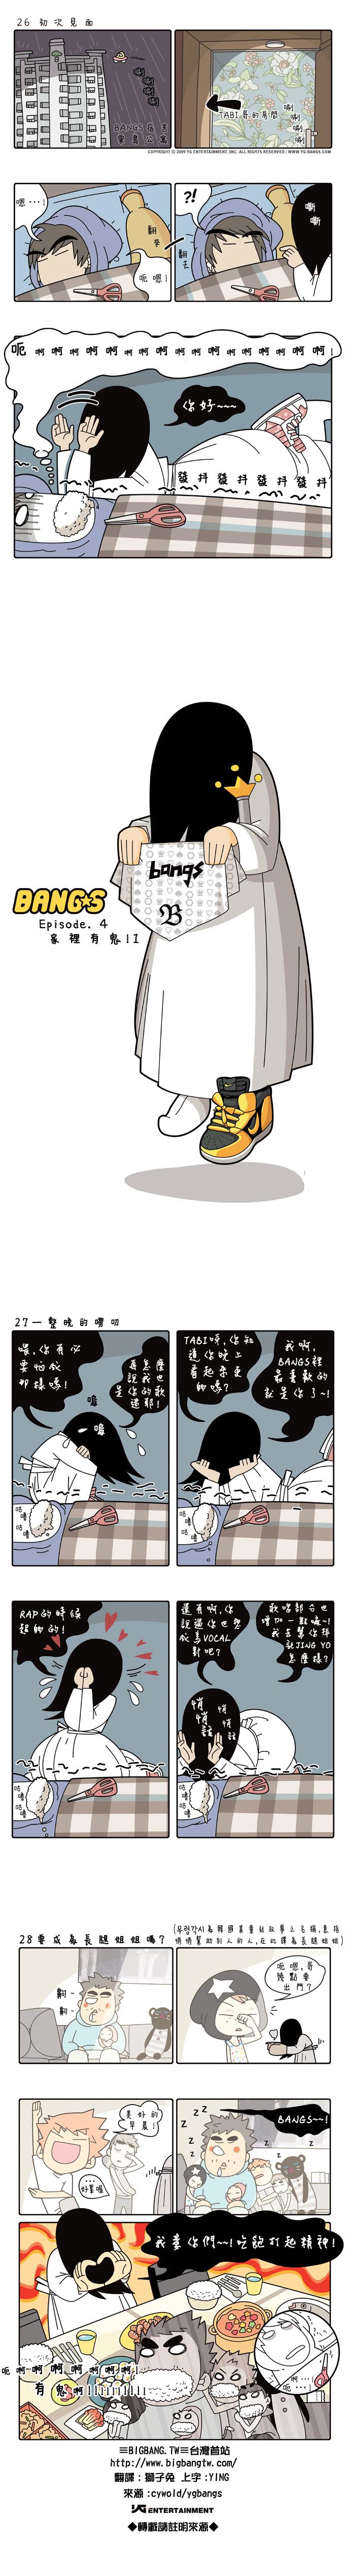 中譯 20090401_Episode 4_家裡有鬼 026-028.png